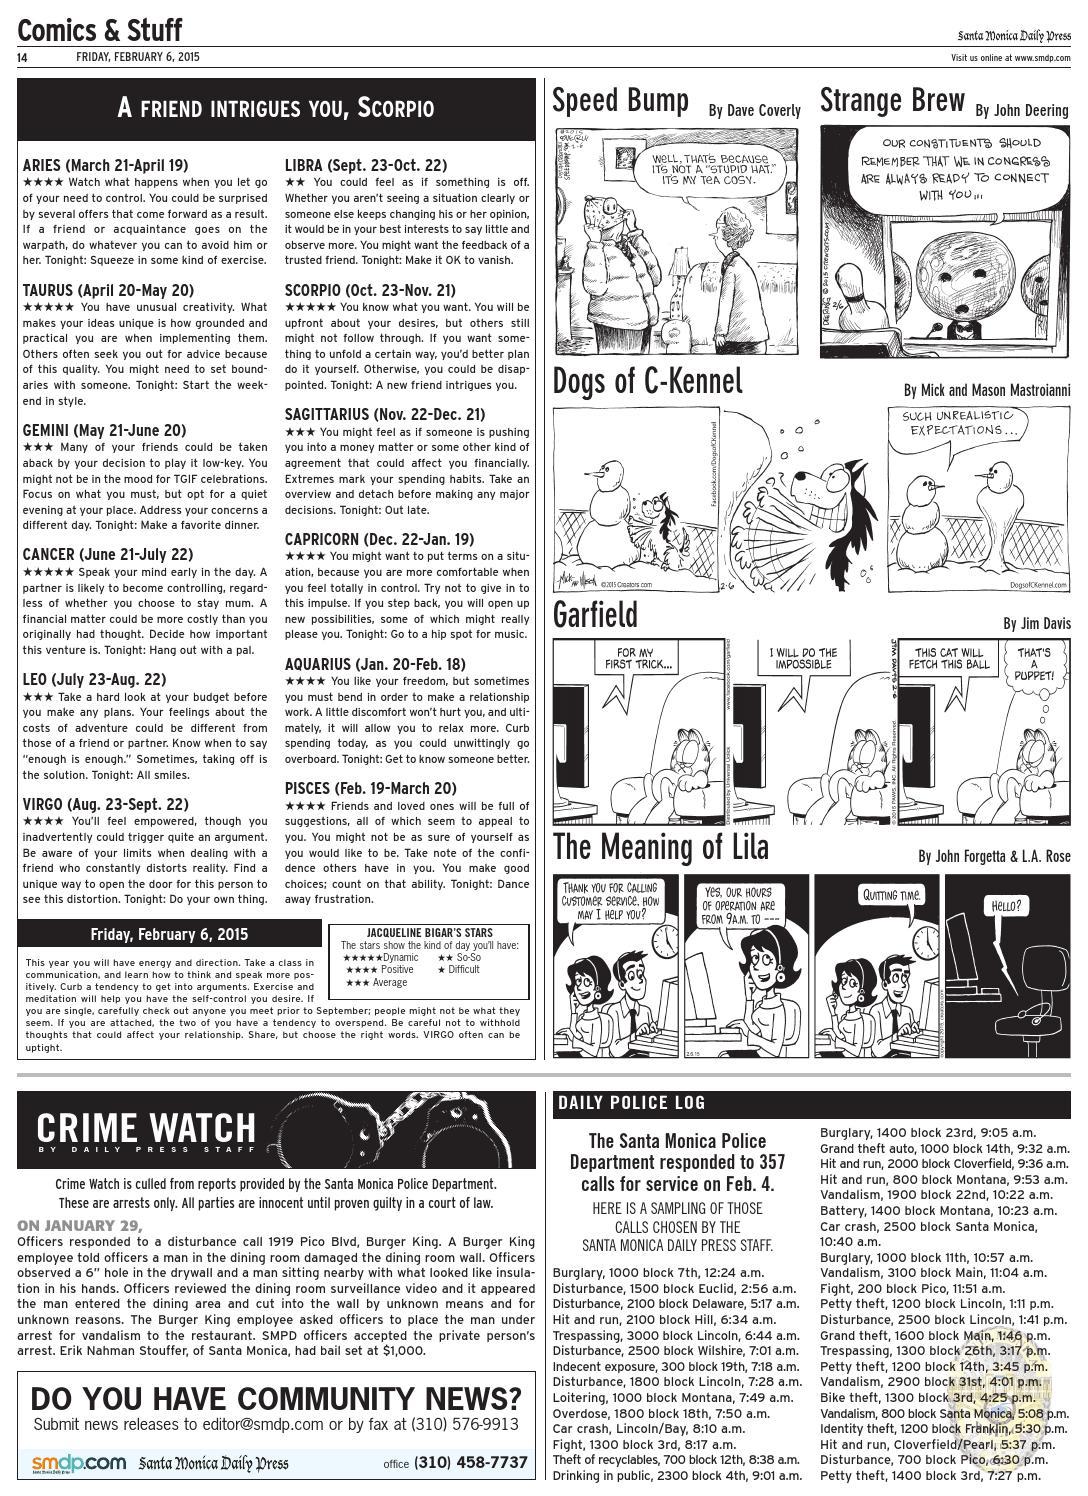 Santa Monica Daily Press, February 6, 2015